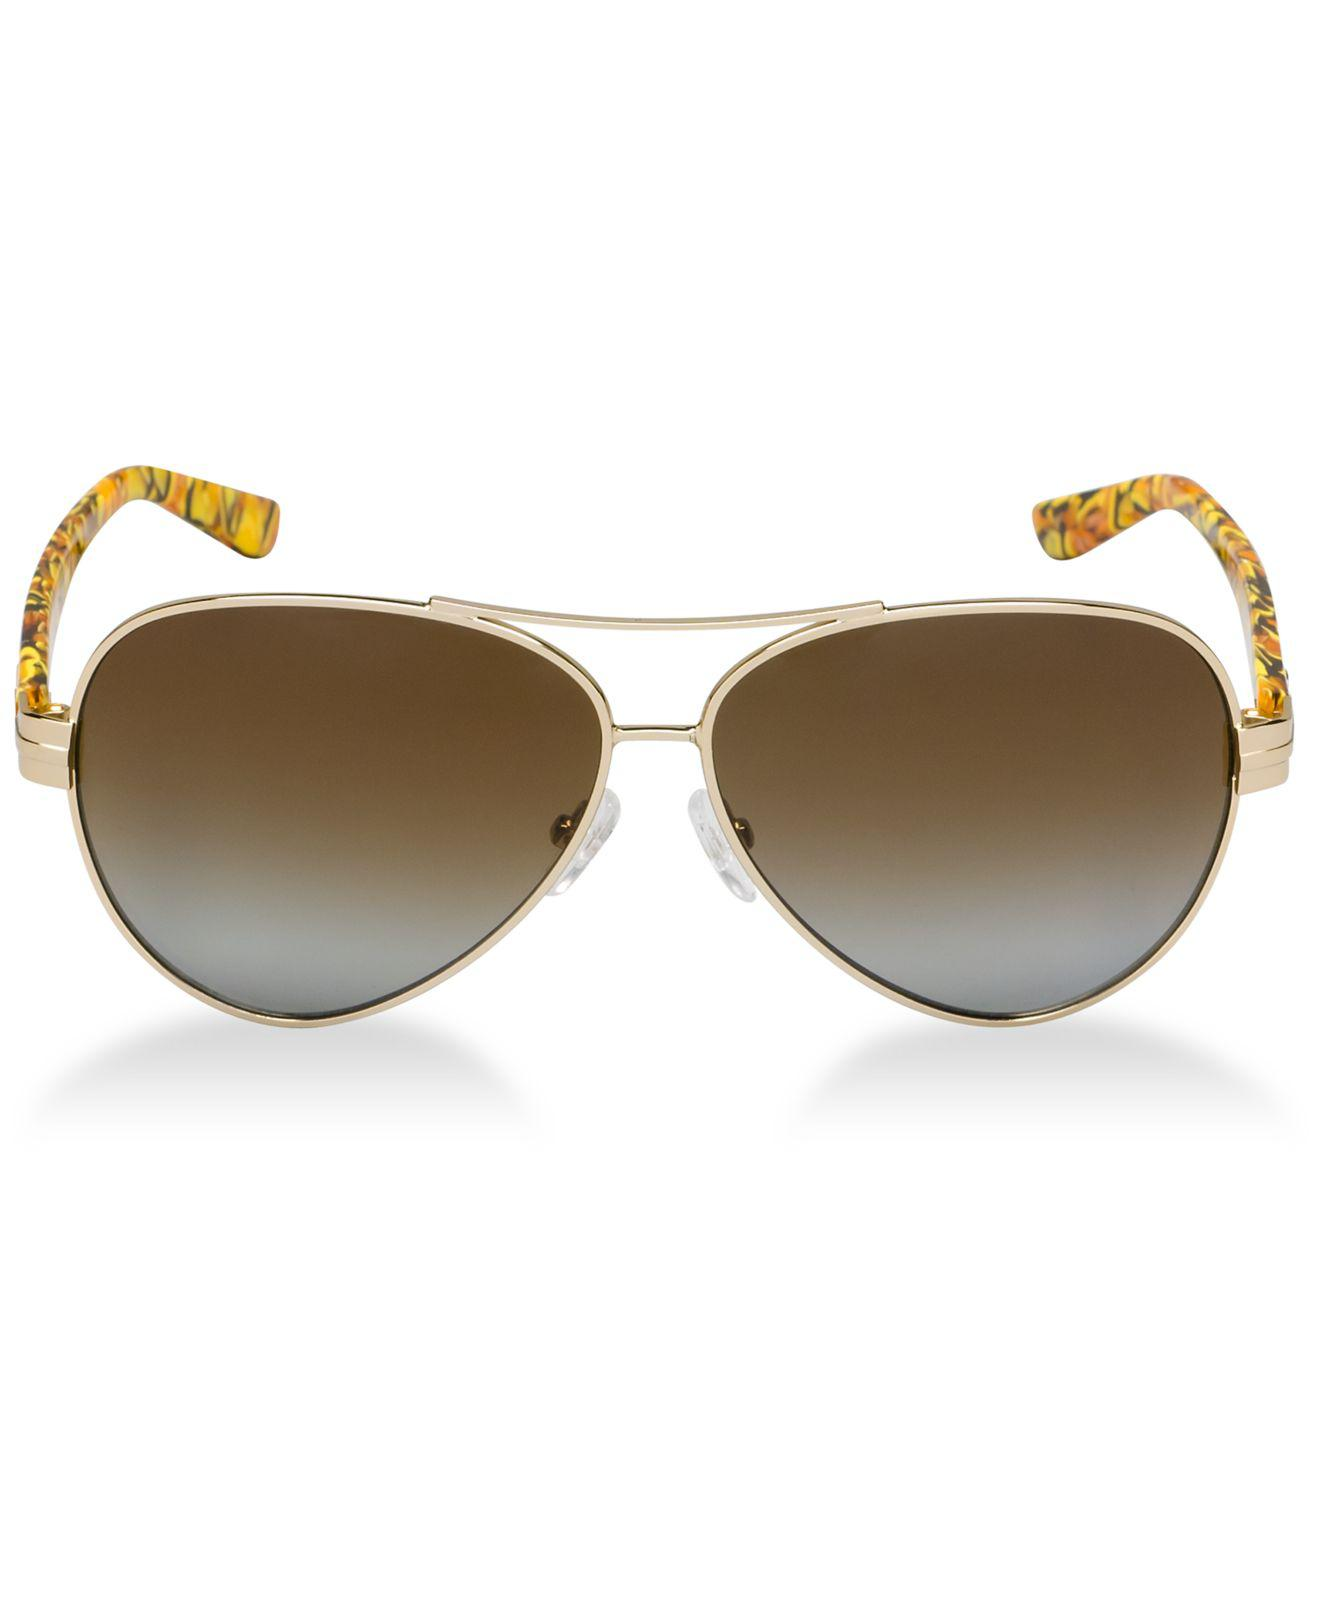 b1829e7fc6a Lyst - Tory Burch Sunglasses